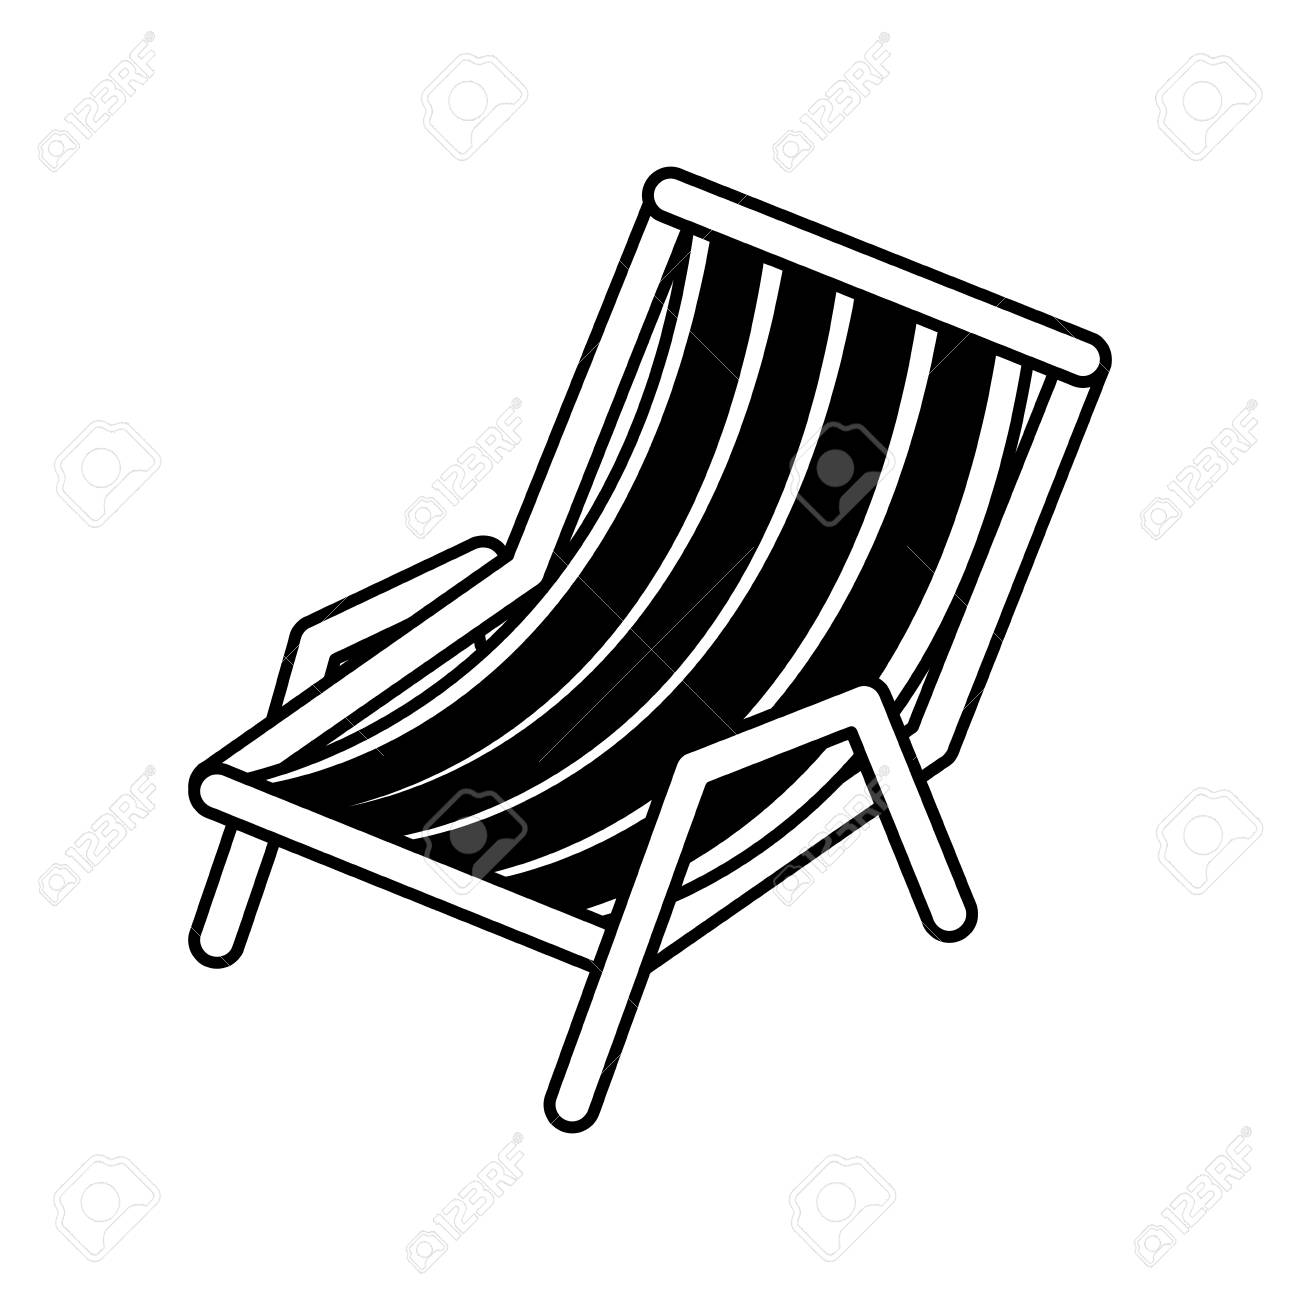 black silhouette of beach chair vector illustration